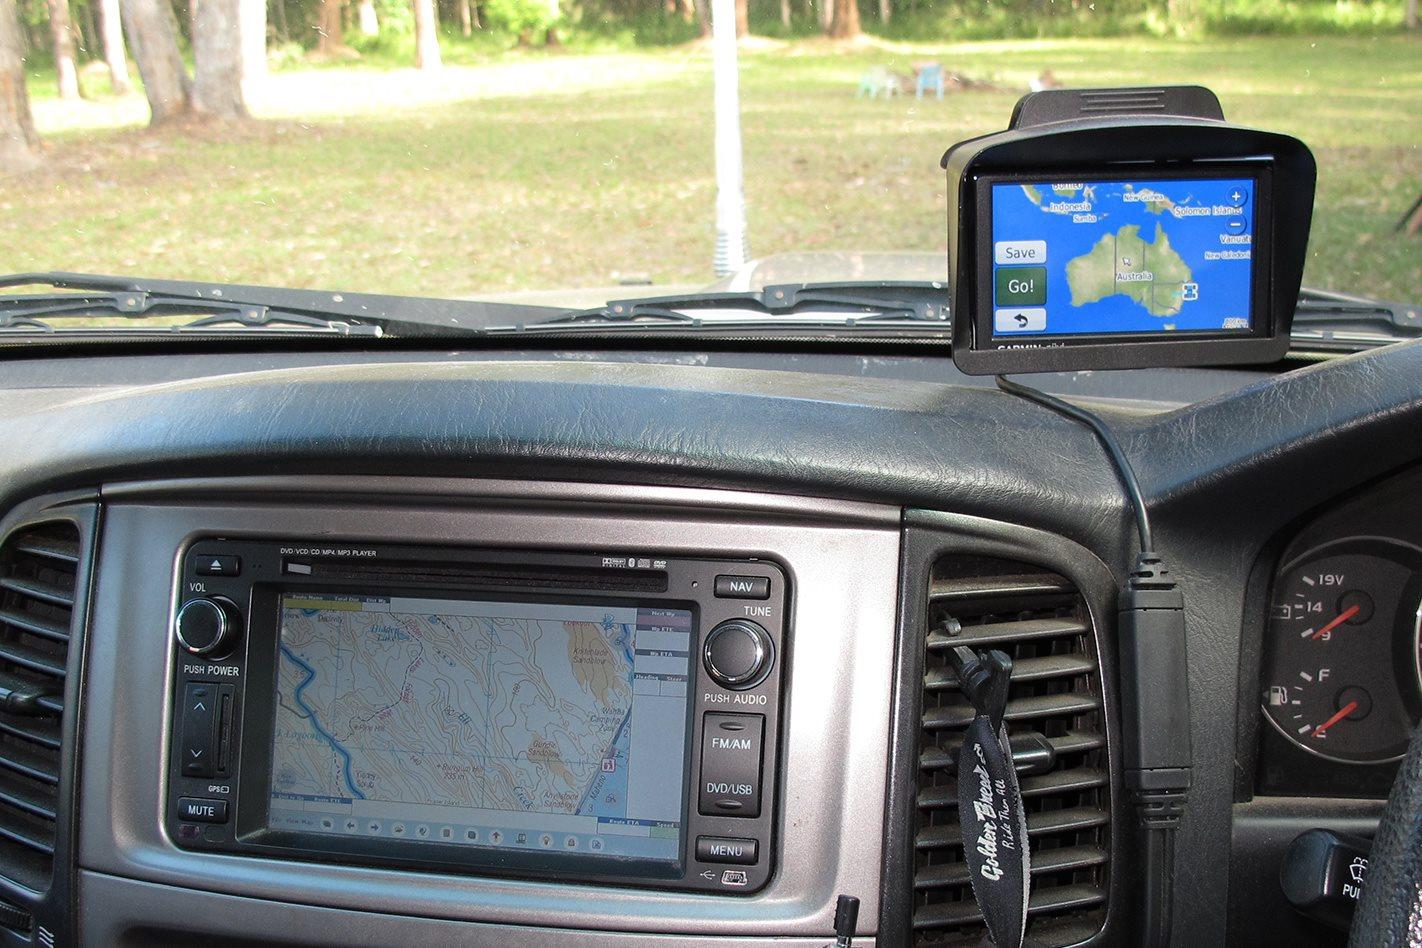 Toyota Land Cruiser 100 Series custom technology